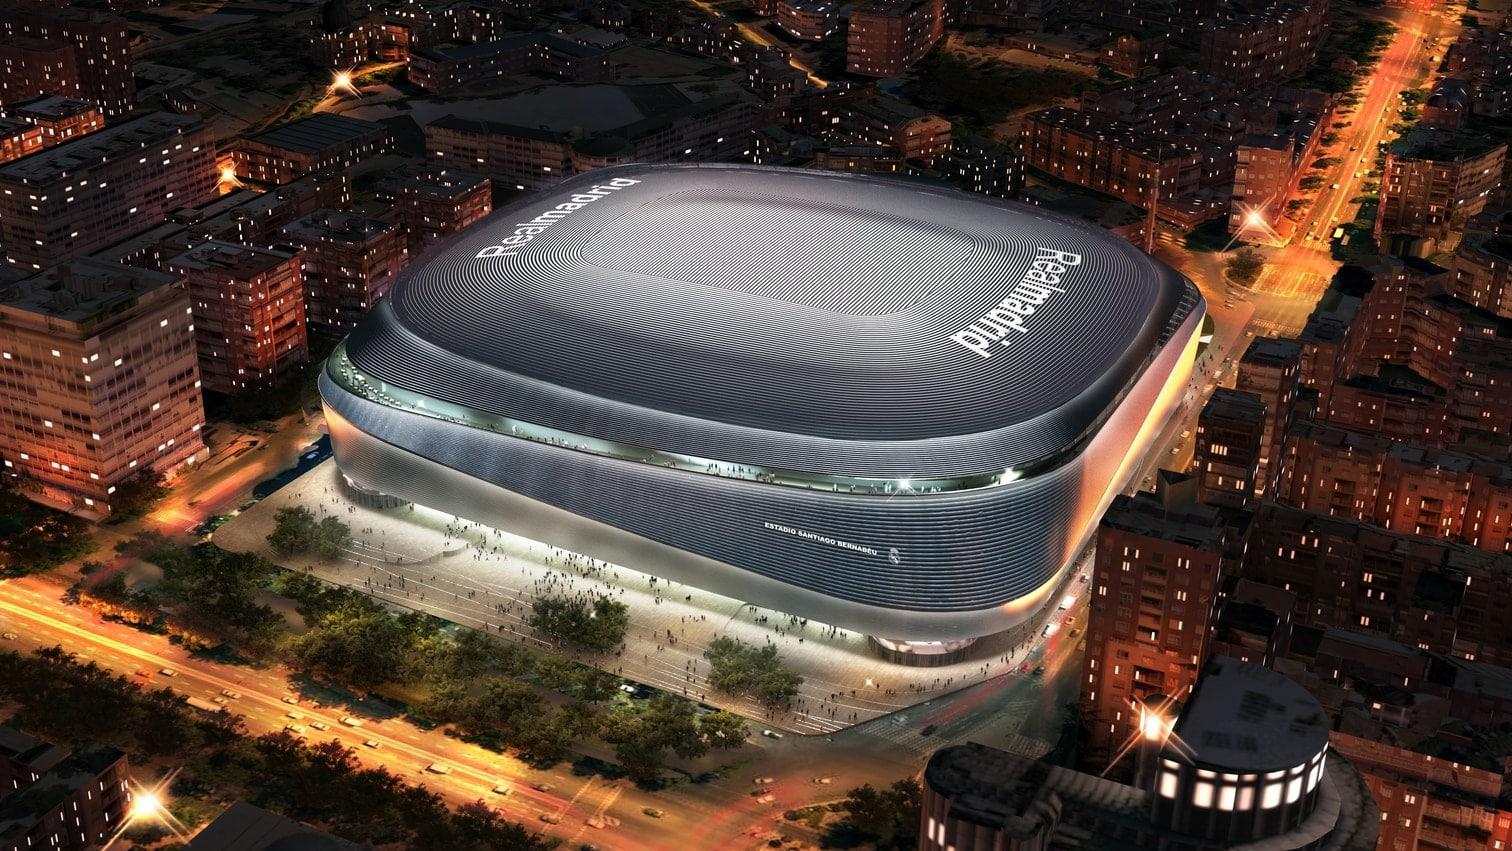 <p>525 Millionen Euro soll das Bauprojekt kosten.</p> Foto: Real Madrid C.F.